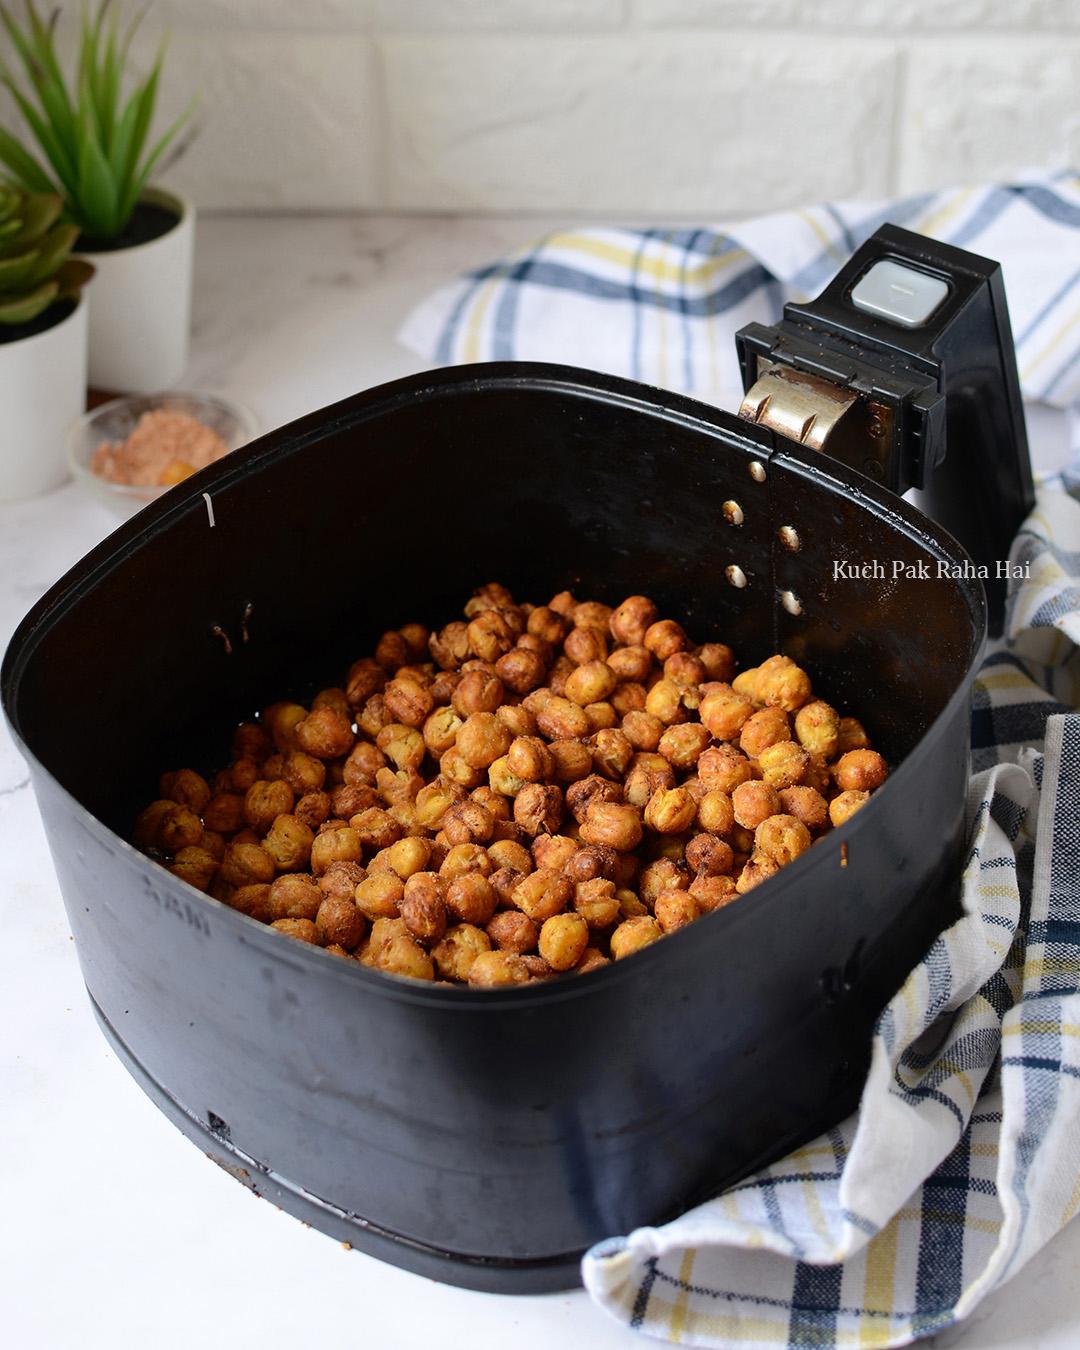 Crispy chickpeas made in air fryer healthy snack recipe